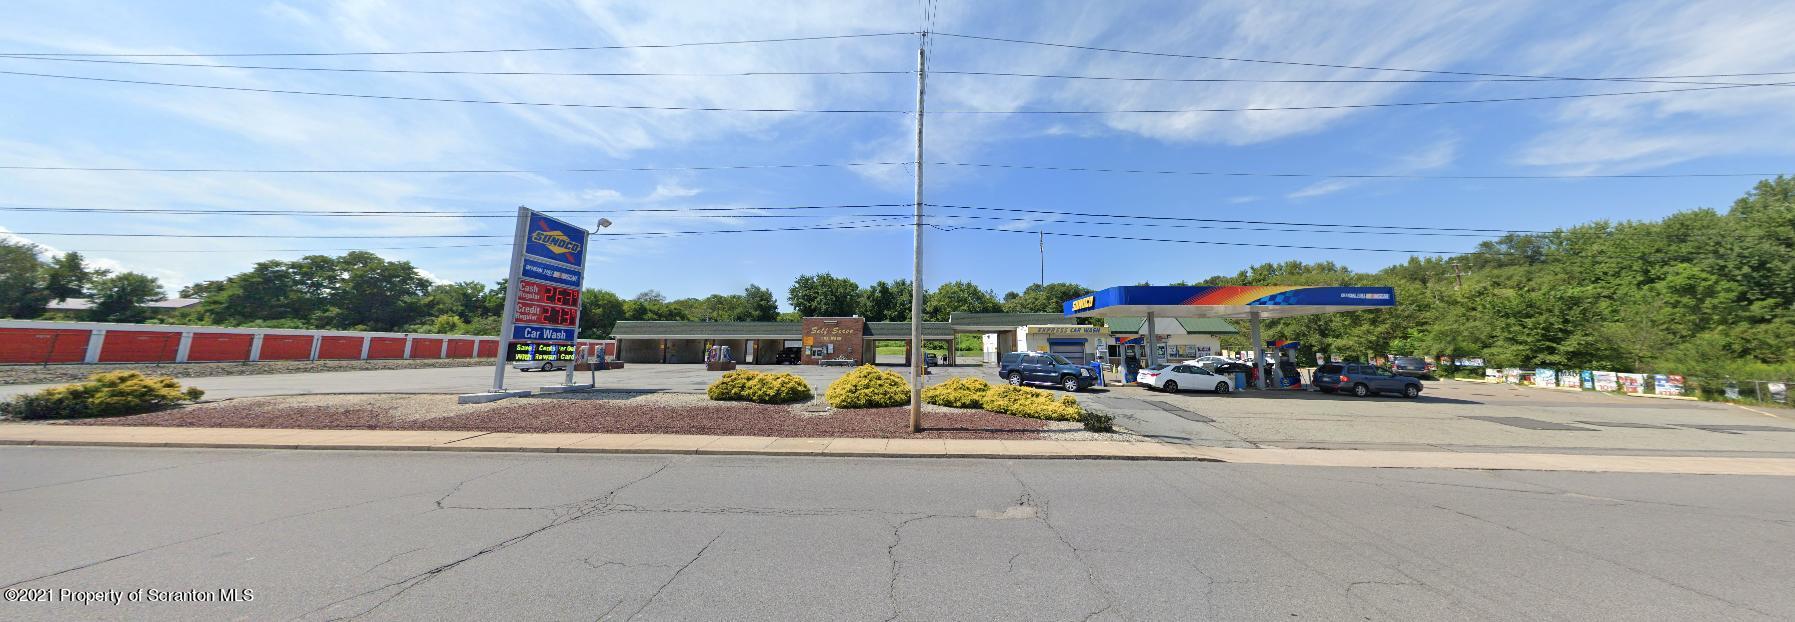 220 7th St, Scranton, Pennsylvania 18503, ,1 BathroomBathrooms,Commercial,For Lease,7th,21-78